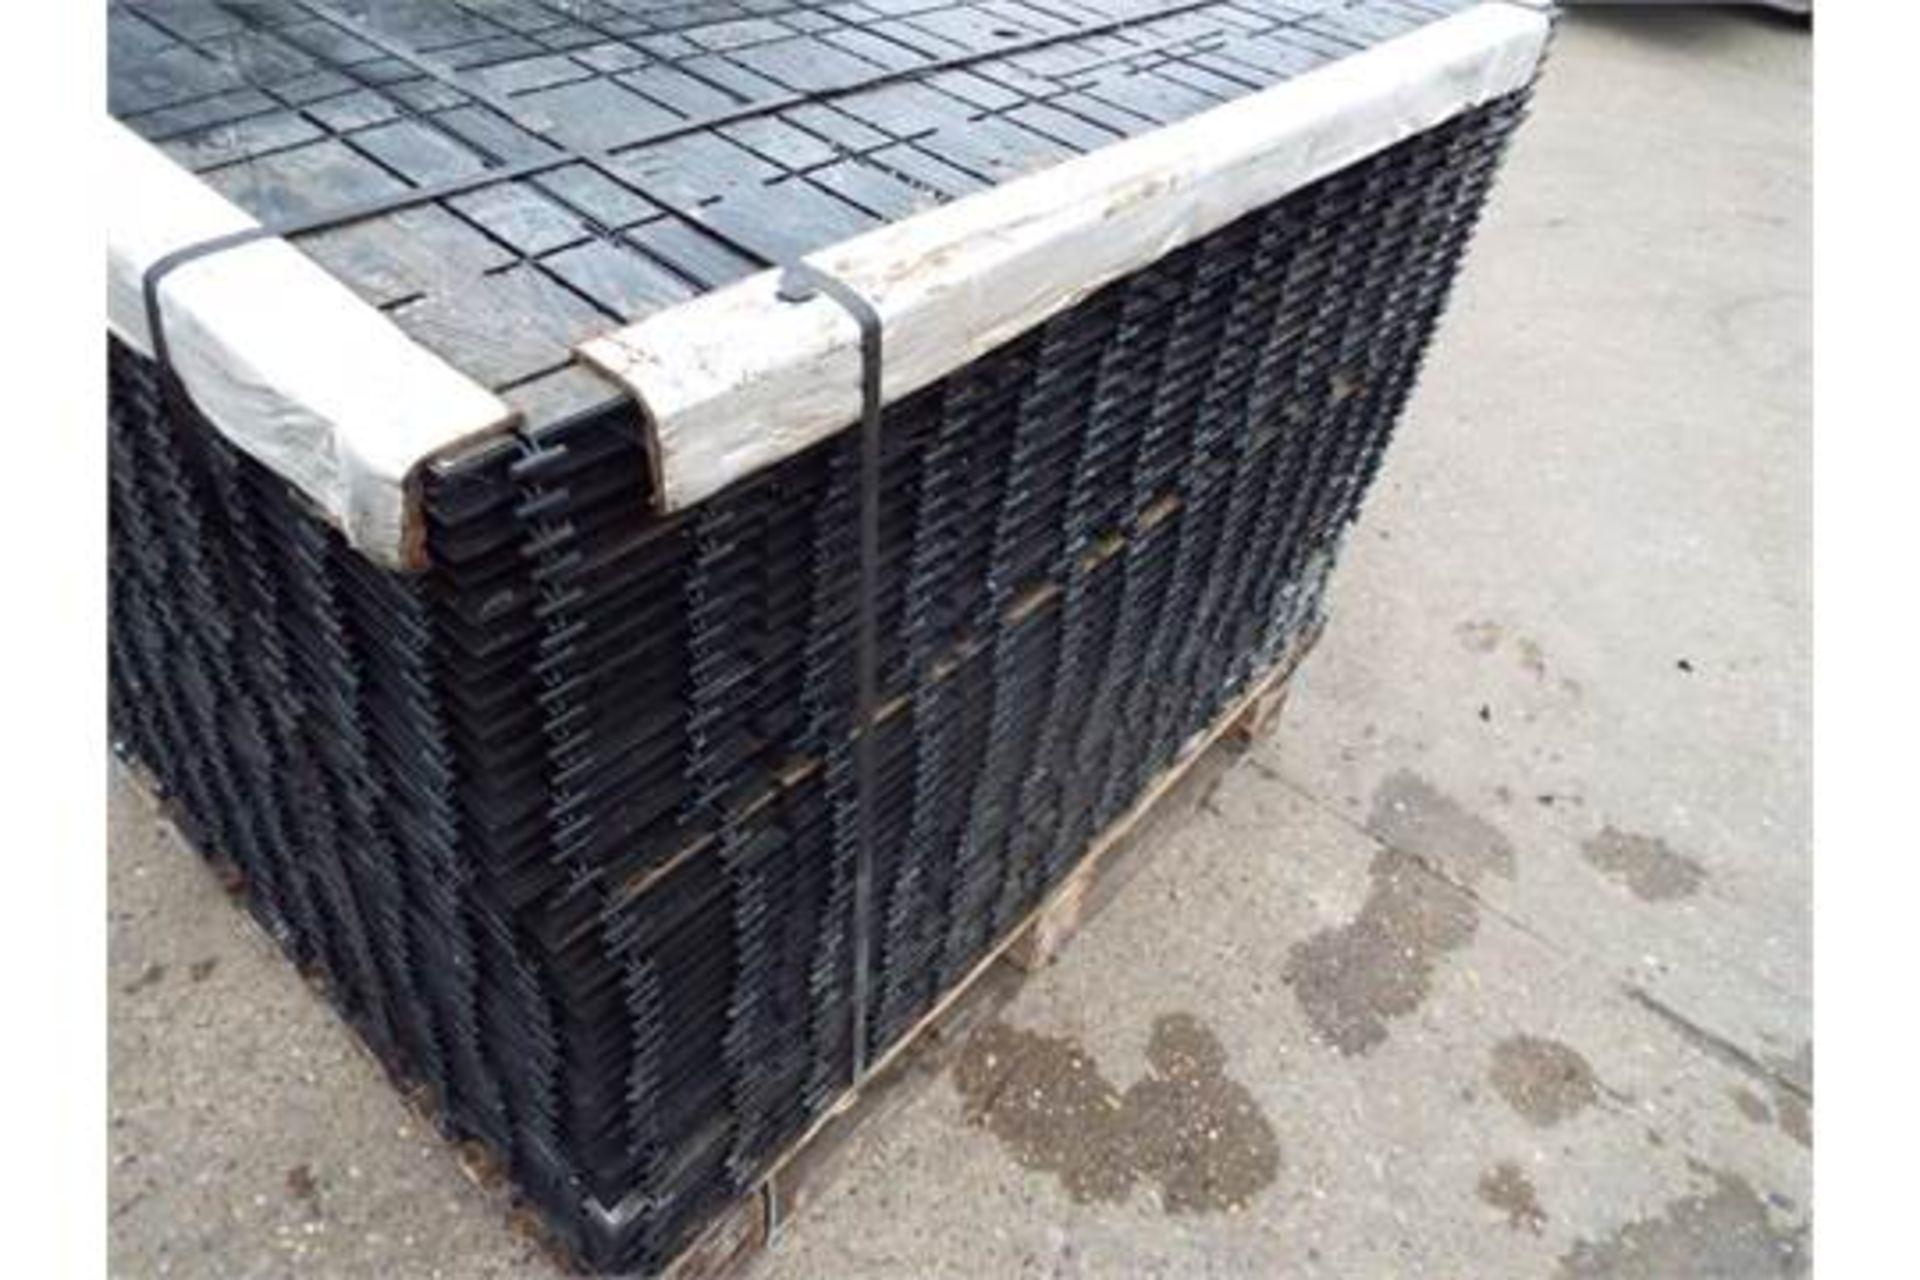 Lot 7 - Rola Trac Interlocking Flooring - Approx 49 Square Metres